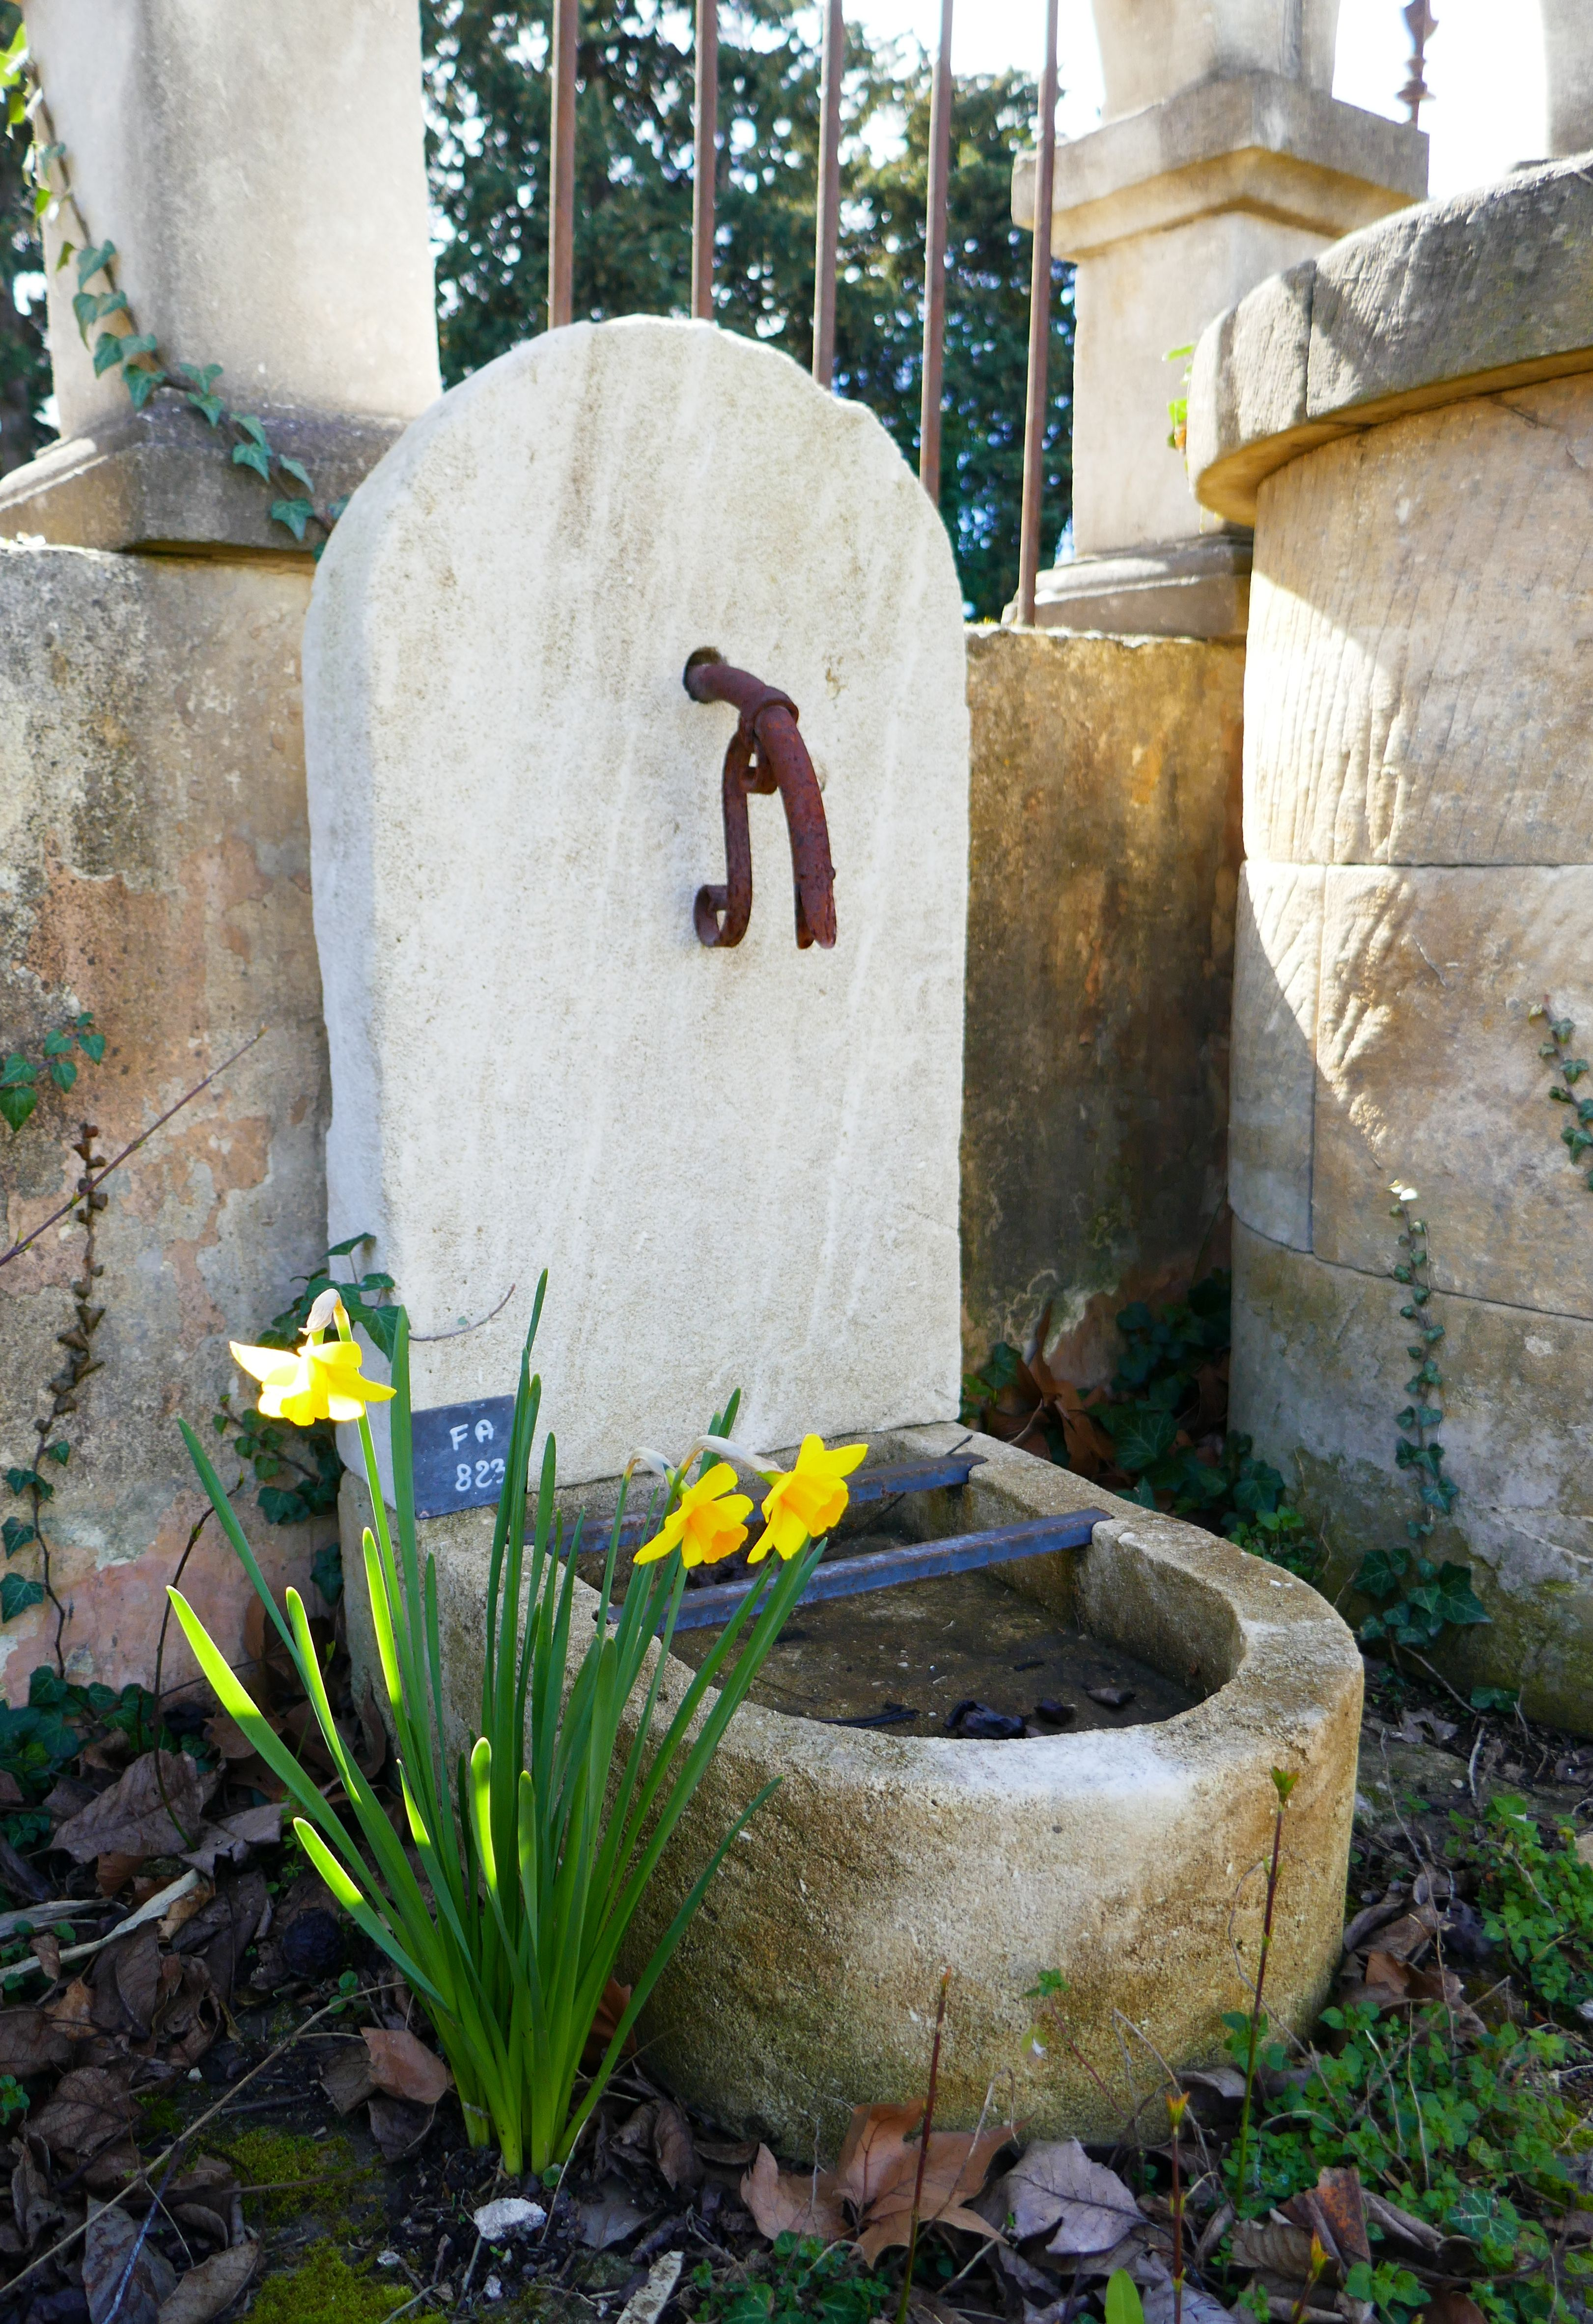 Petite fontaine de jardin en pierre naturelle de type borne à eau ...